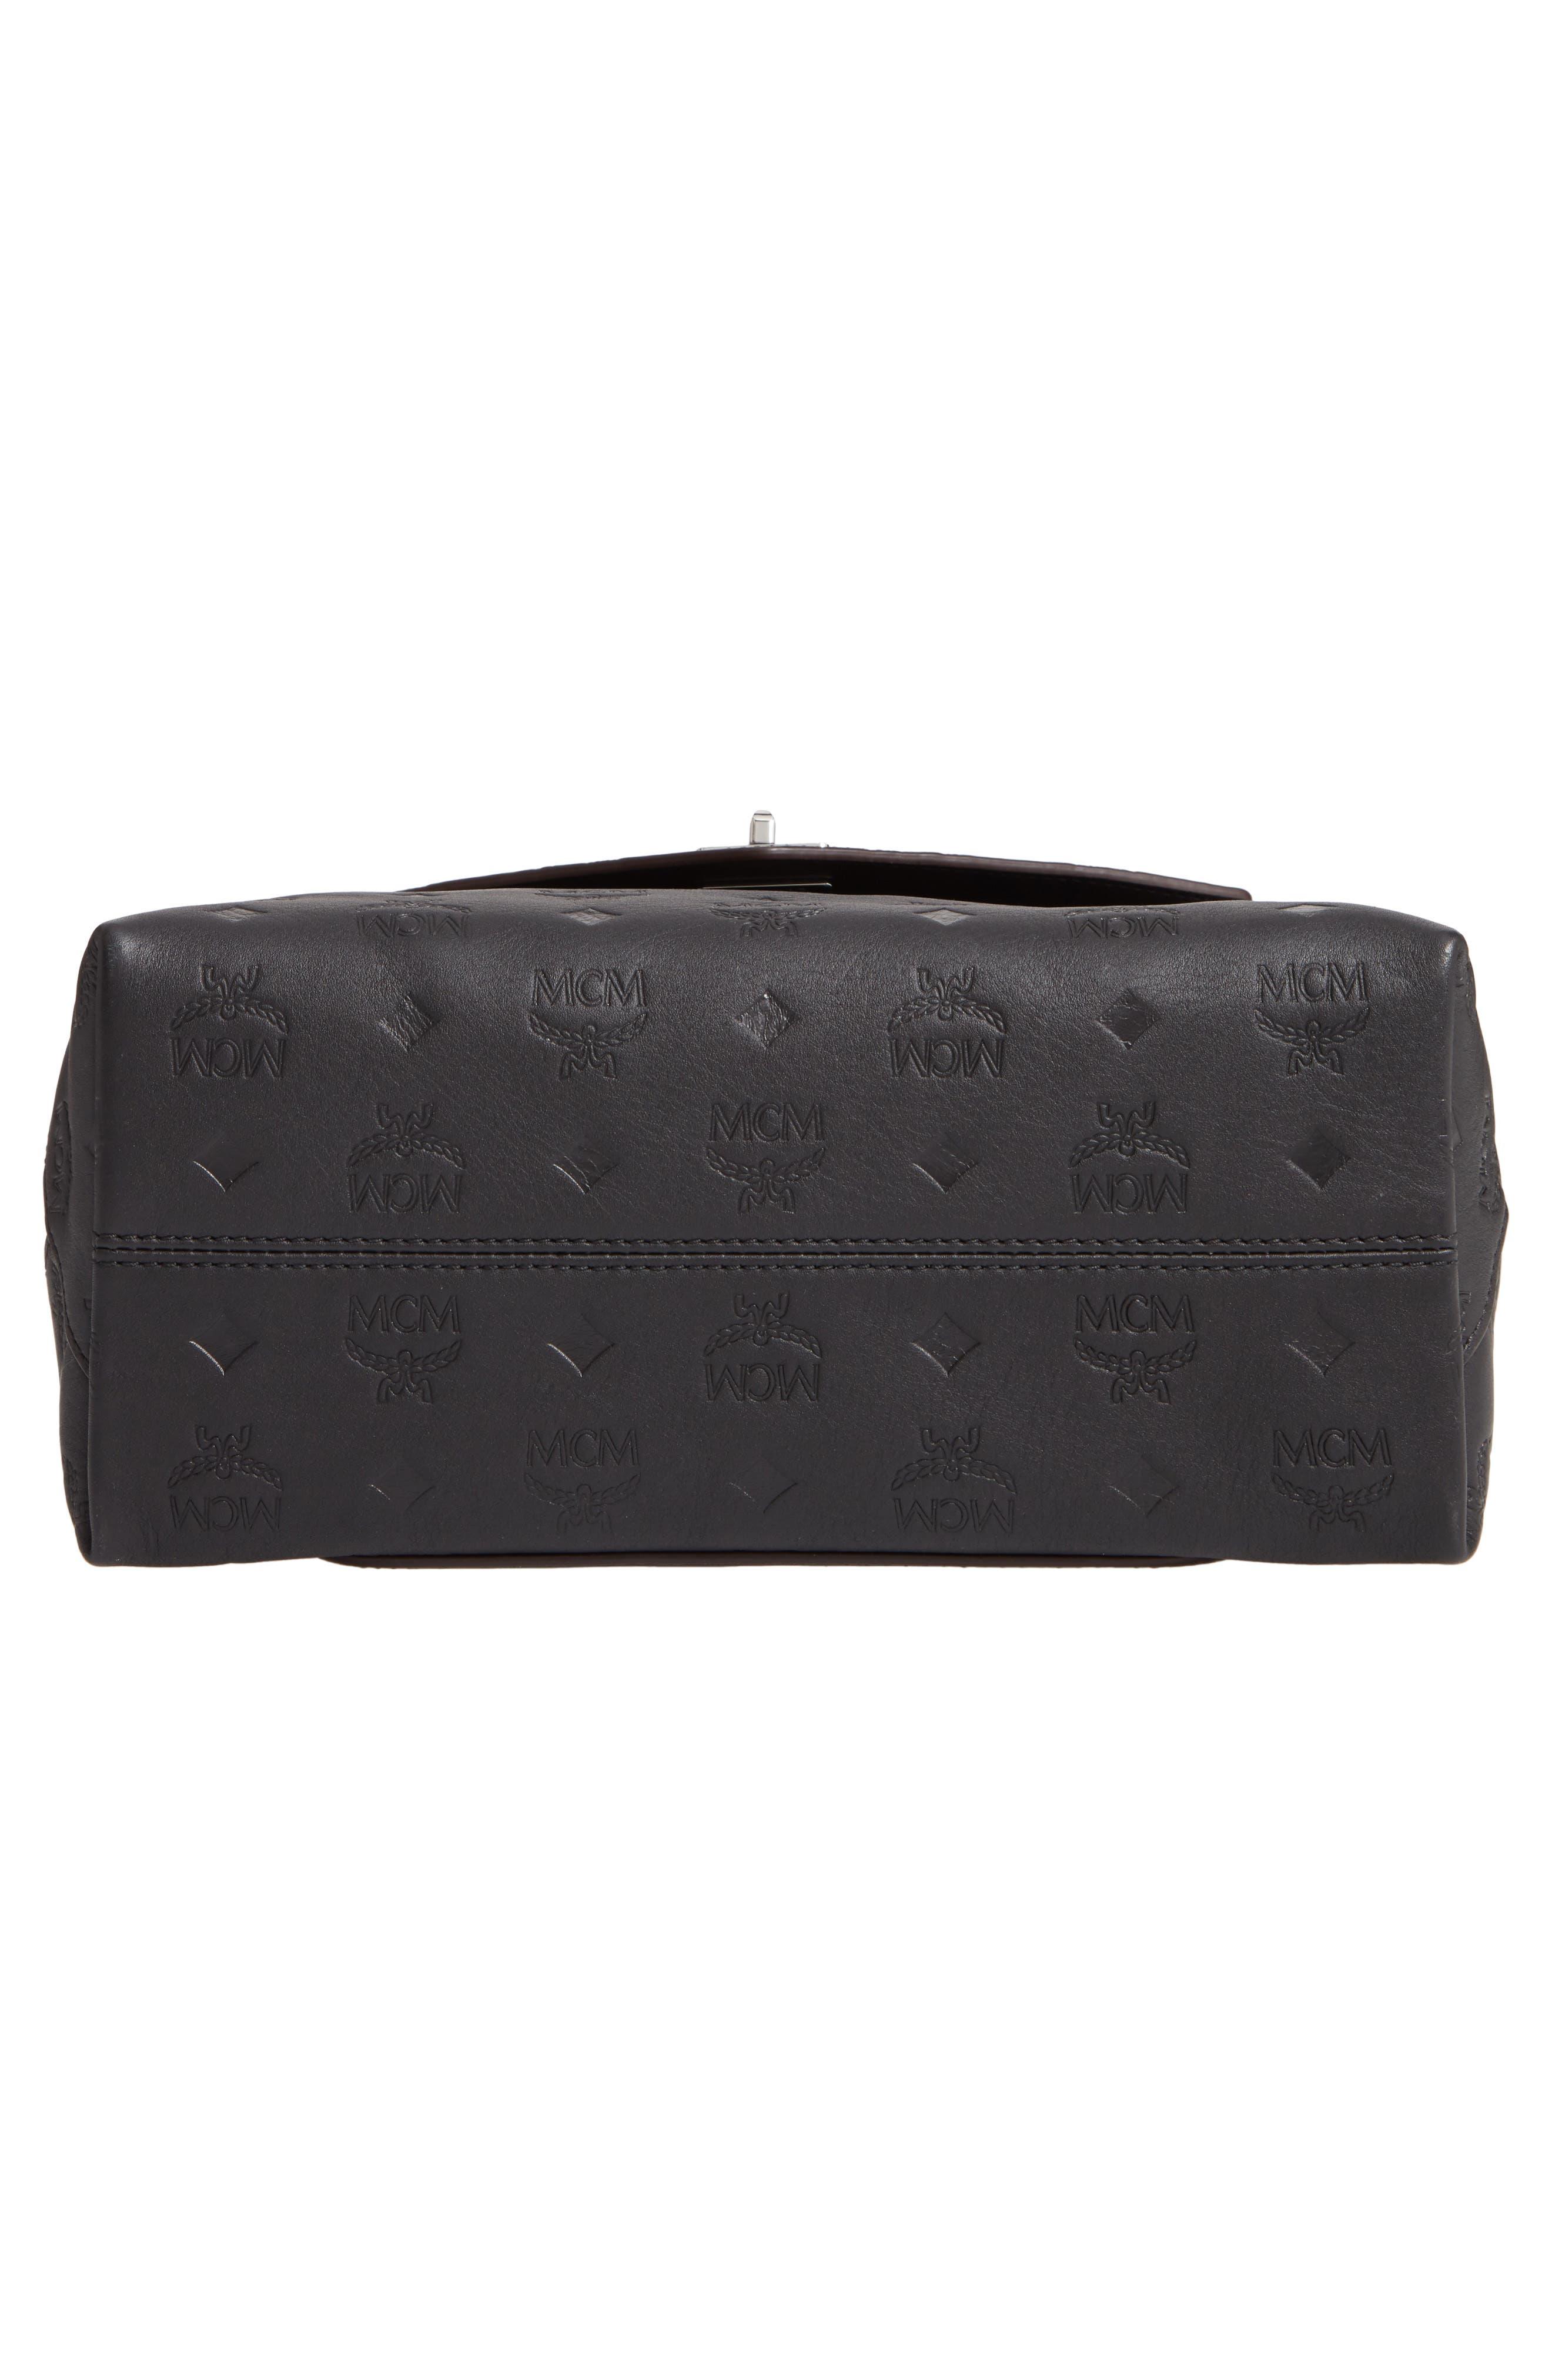 MCM,                             Essentials Monogram Leather Small Crossbody Bag,                             Alternate thumbnail 7, color,                             BLACK